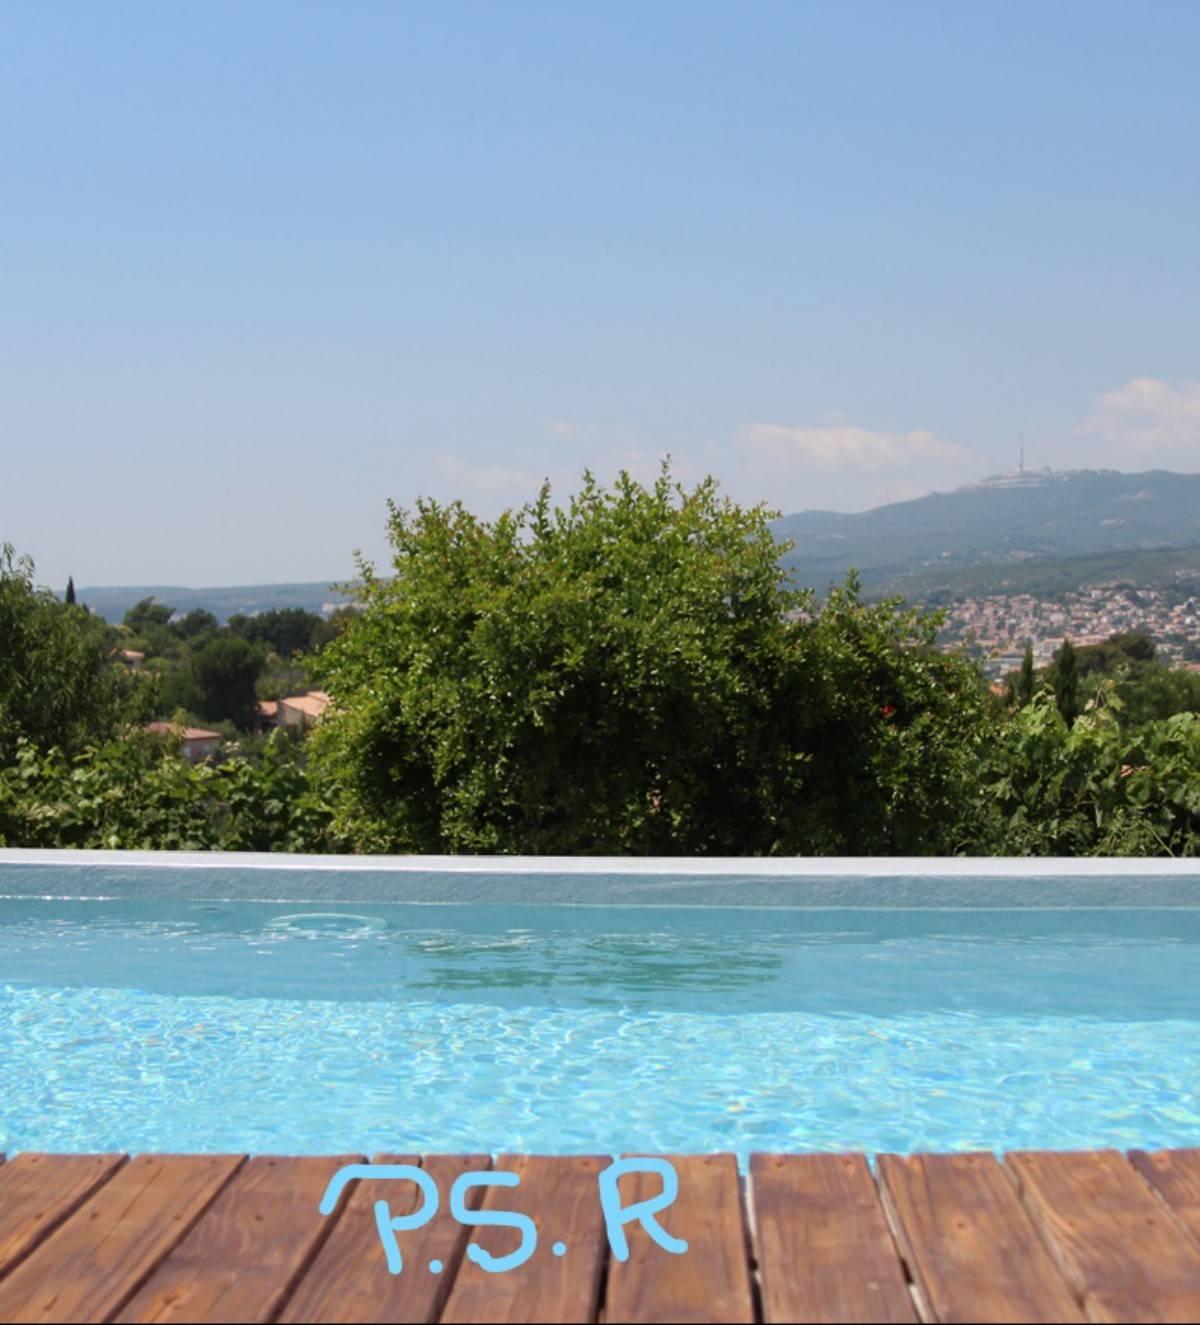 Piscine b ton r nover r novation de piscine marseille 13015 psr - Entretien piscine marseille ...